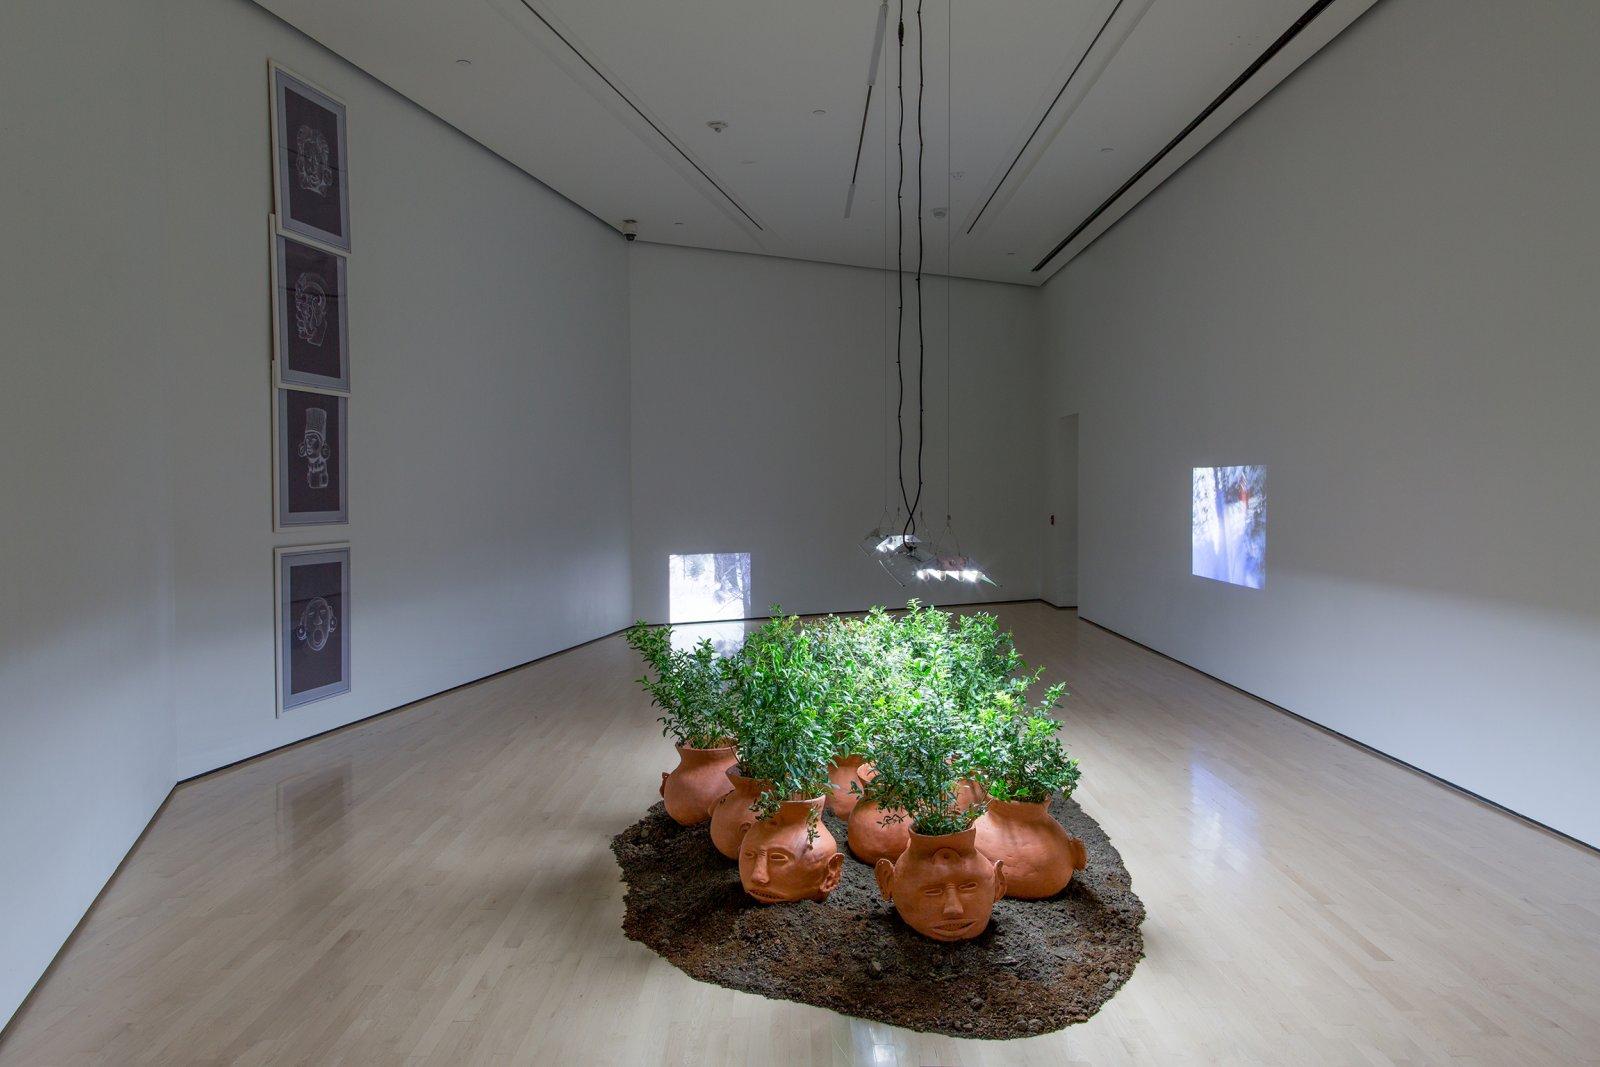 Duane Linkater, installation view, Field Station: Duane Linklater, MSU Broad, East Lansing, MI, 2017 by Duane Linklater